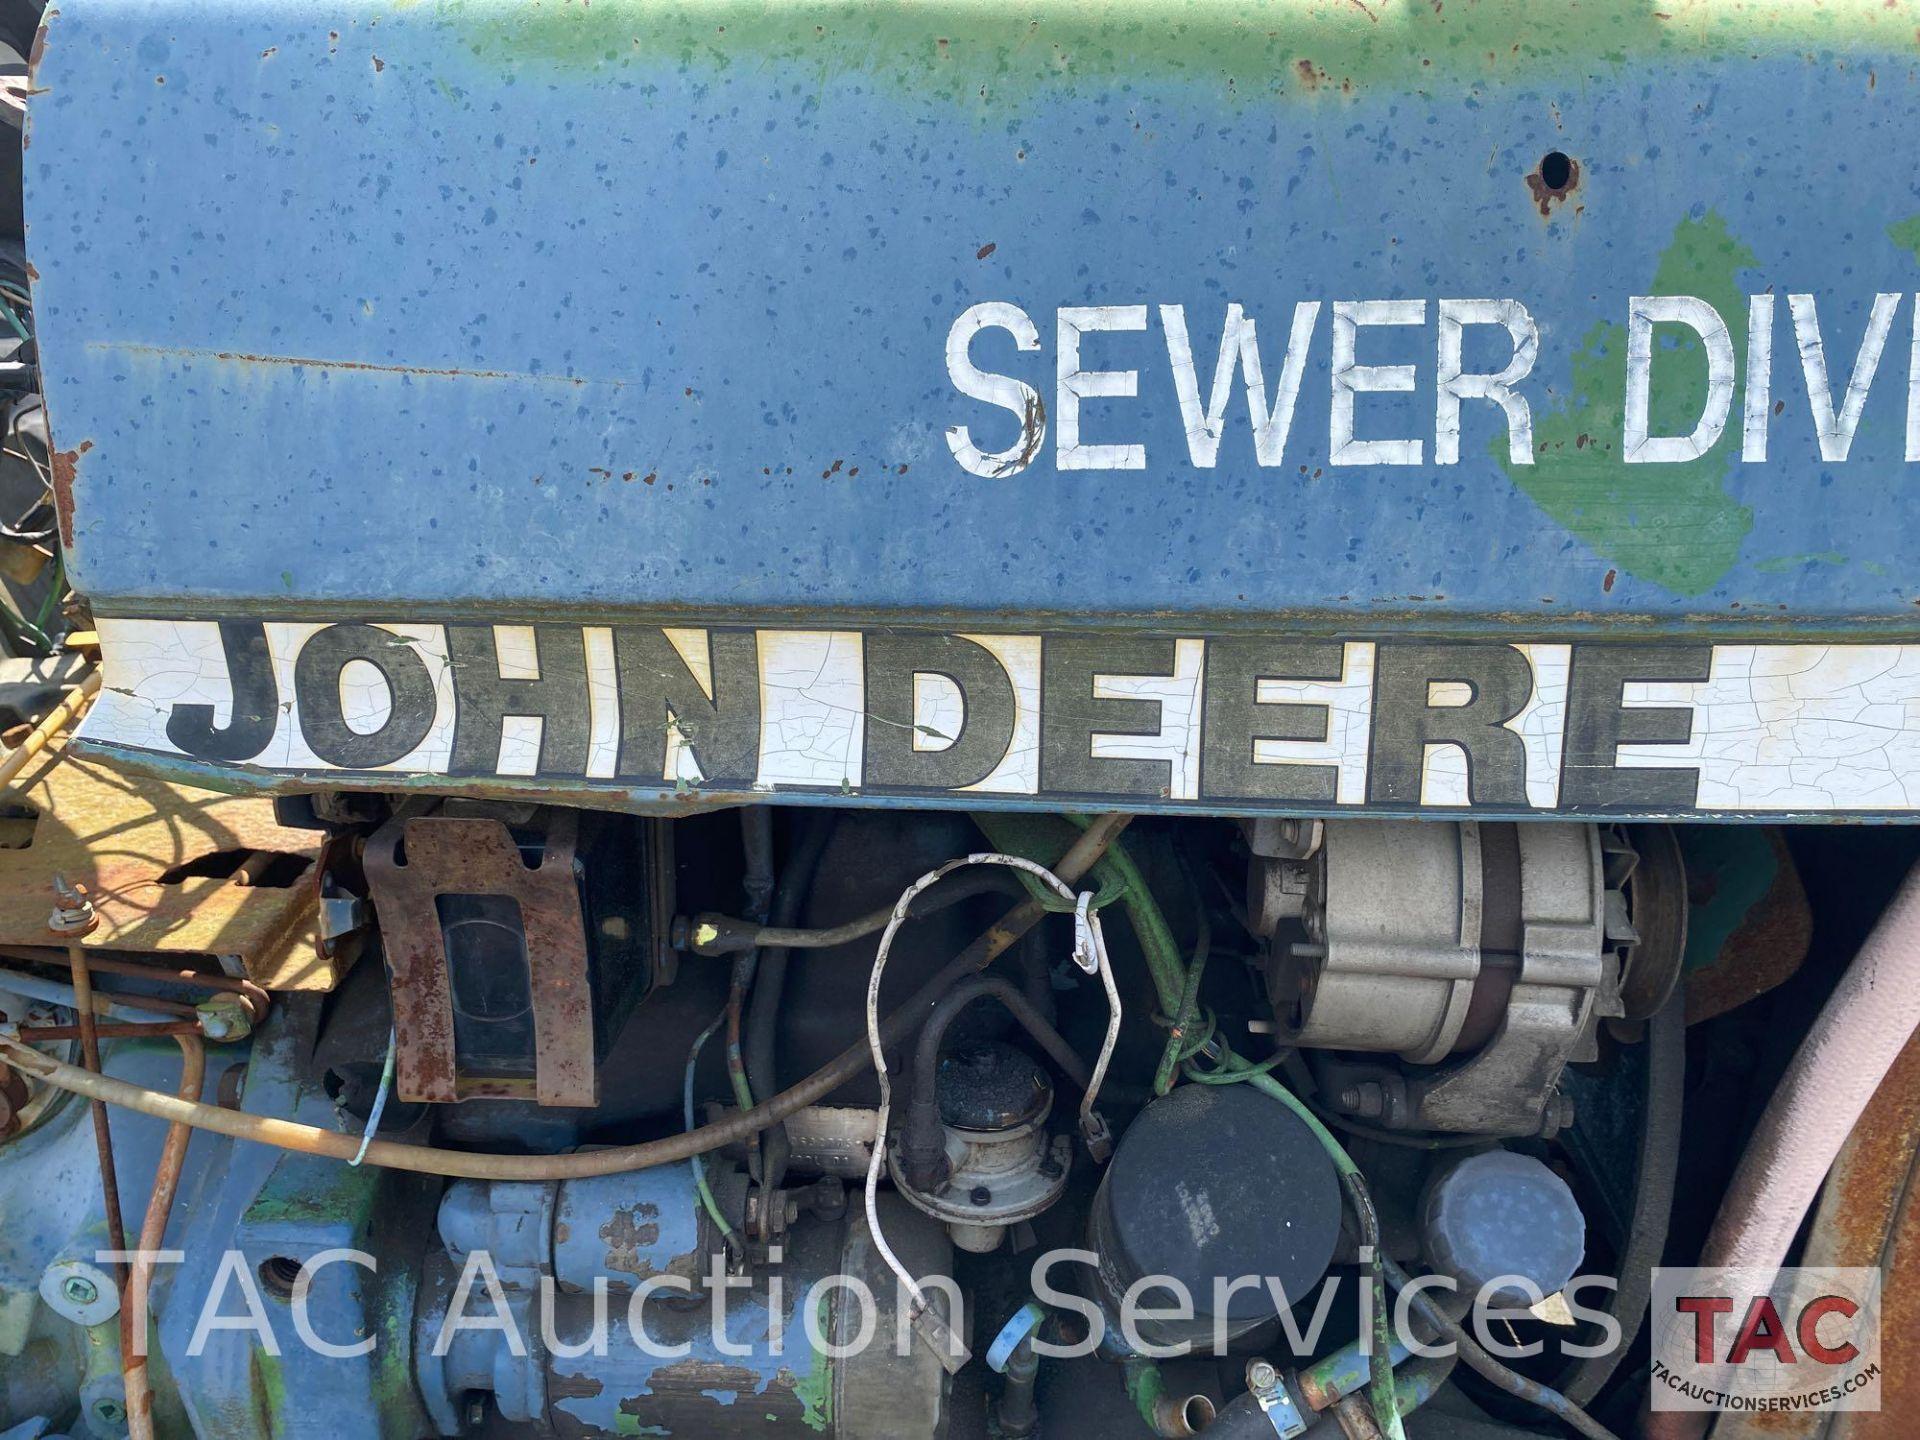 John Deere 2150 Farm Tractor - Image 7 of 34